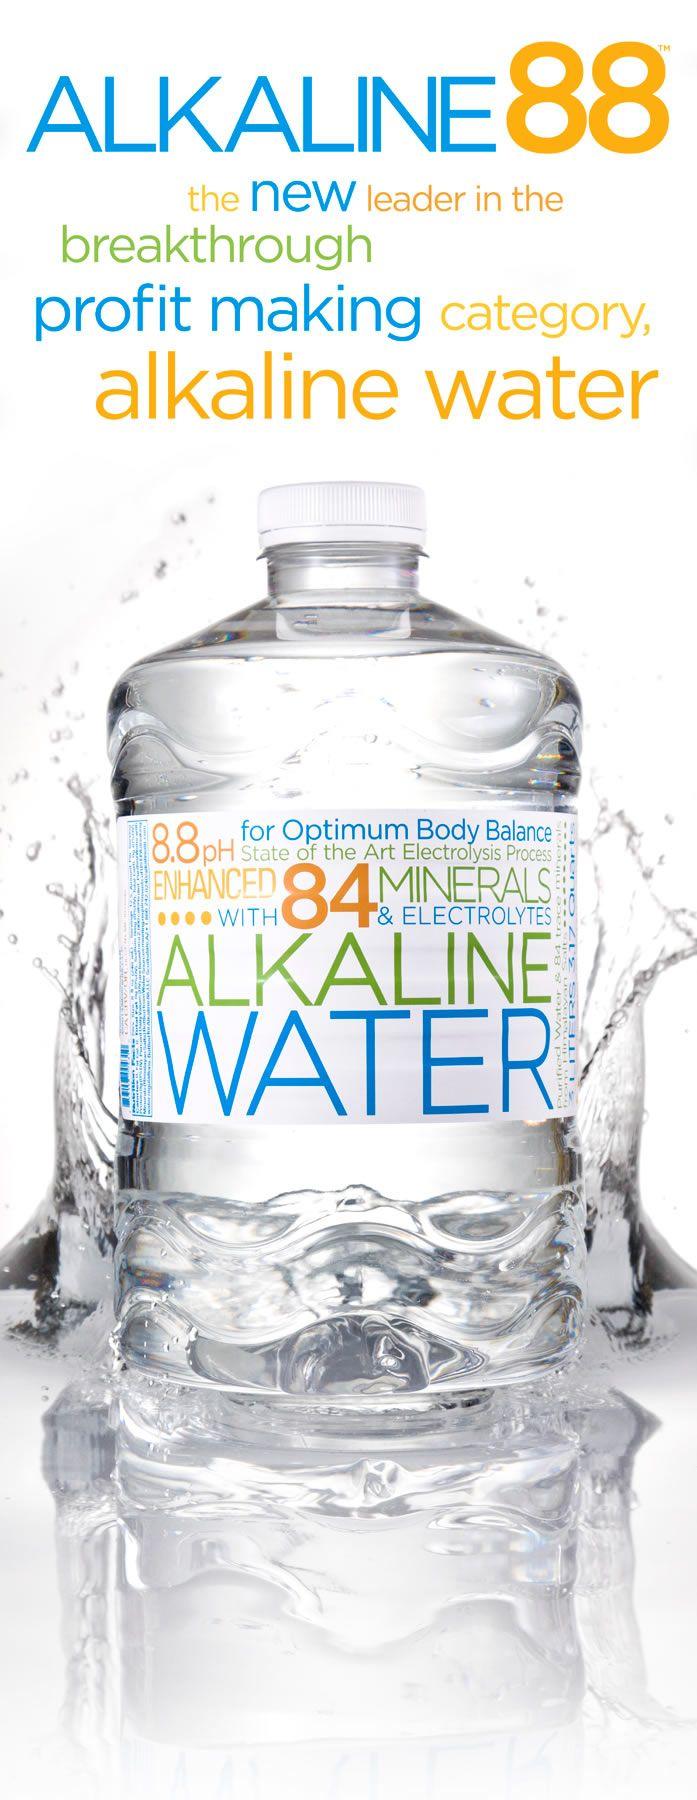 Alkaline Water Is The Healthiest Water Alkaline Water Healthy Water Alkaline